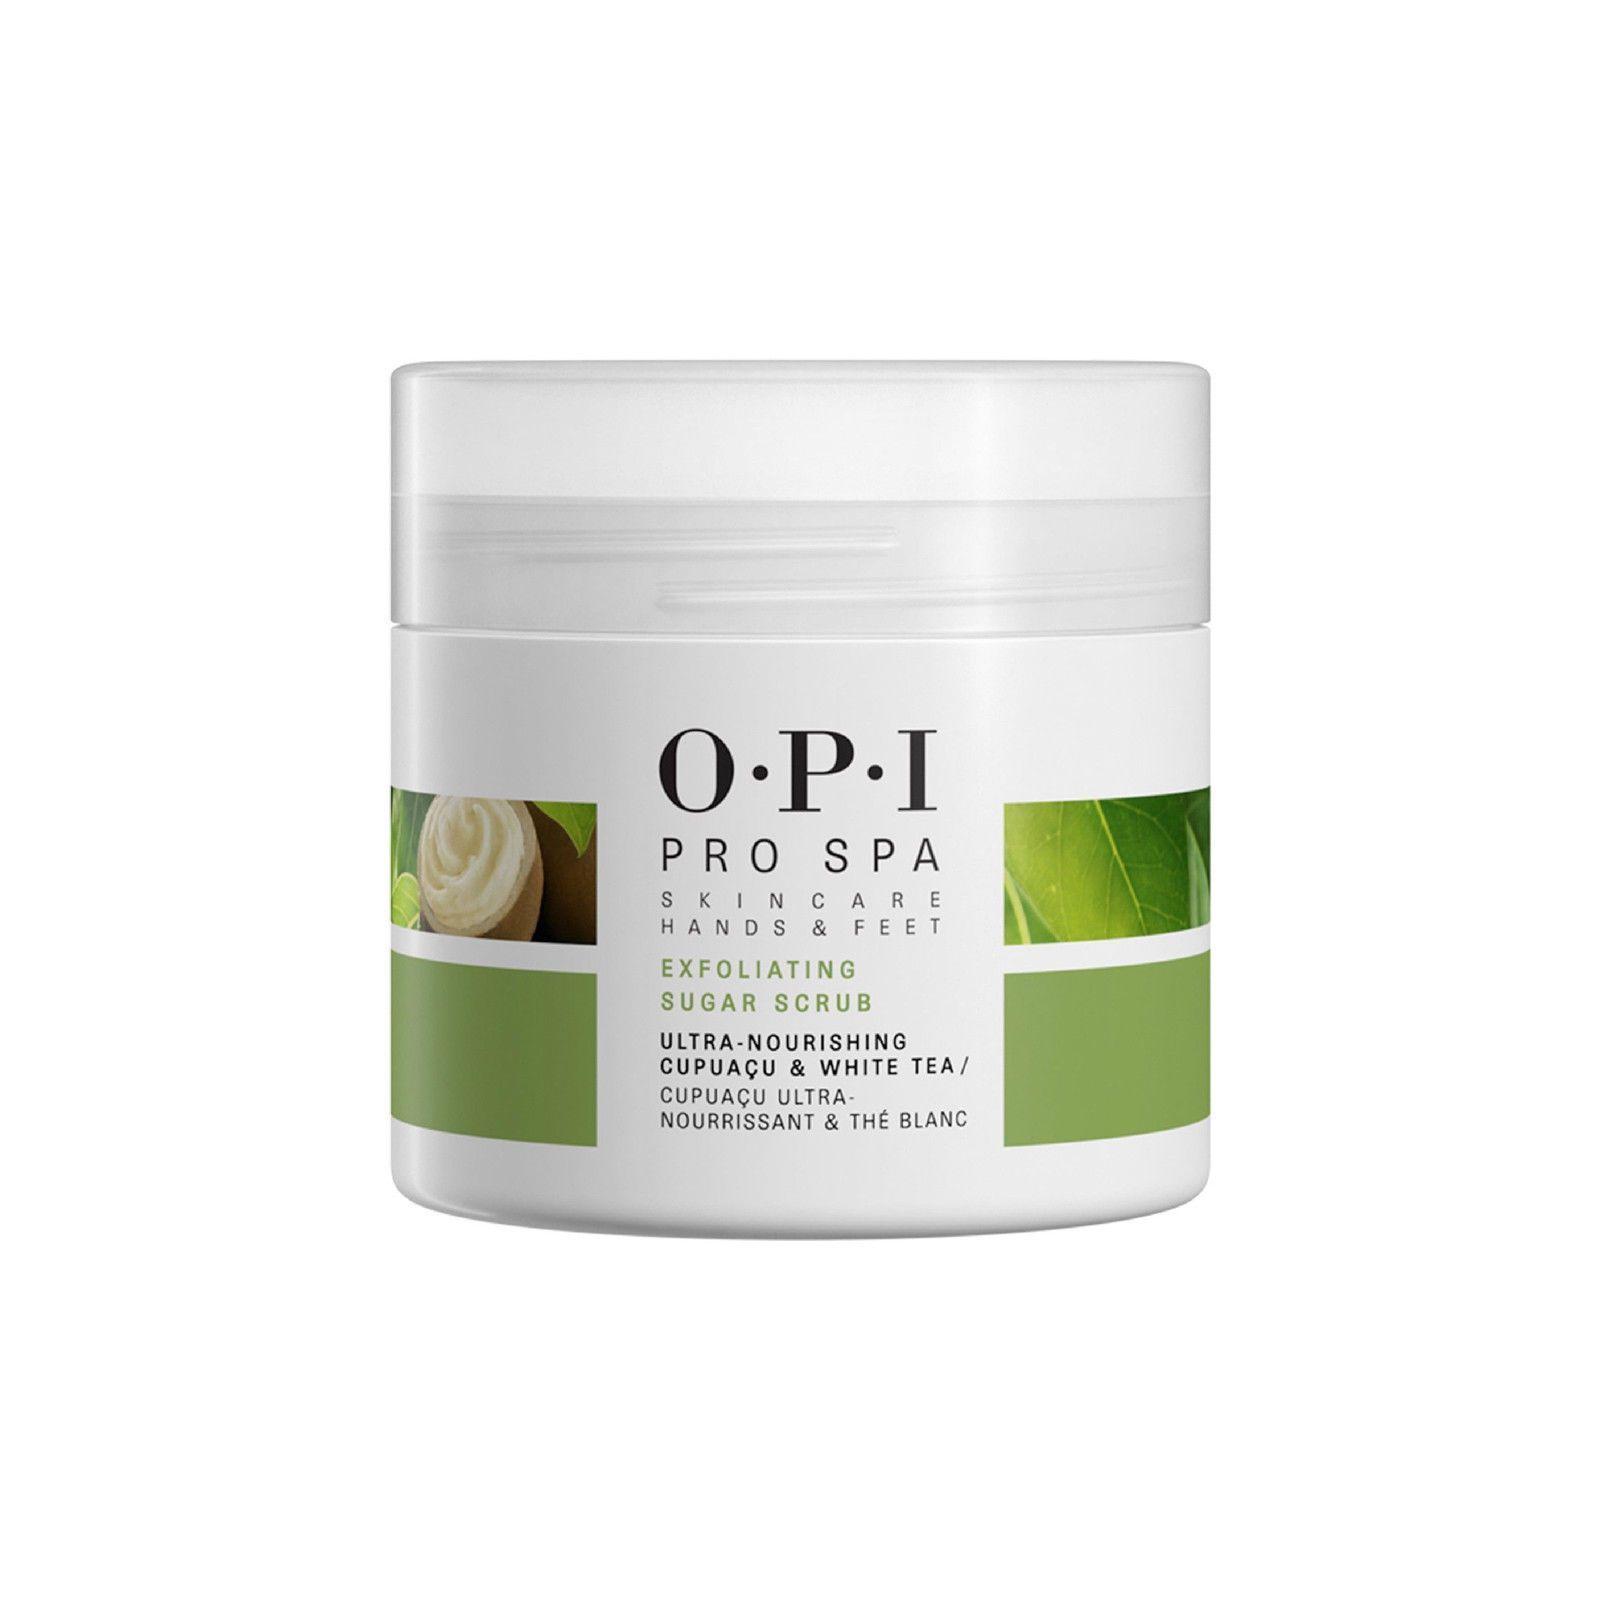 Spas Baths And Supplies 36430 Genuine Opi Pro Spa Skin Care Hands And Feet Exfoliating Sugar Scrub 136g 4 8oz Skin Care Spa Sugar Exfoliating Scrub The Balm